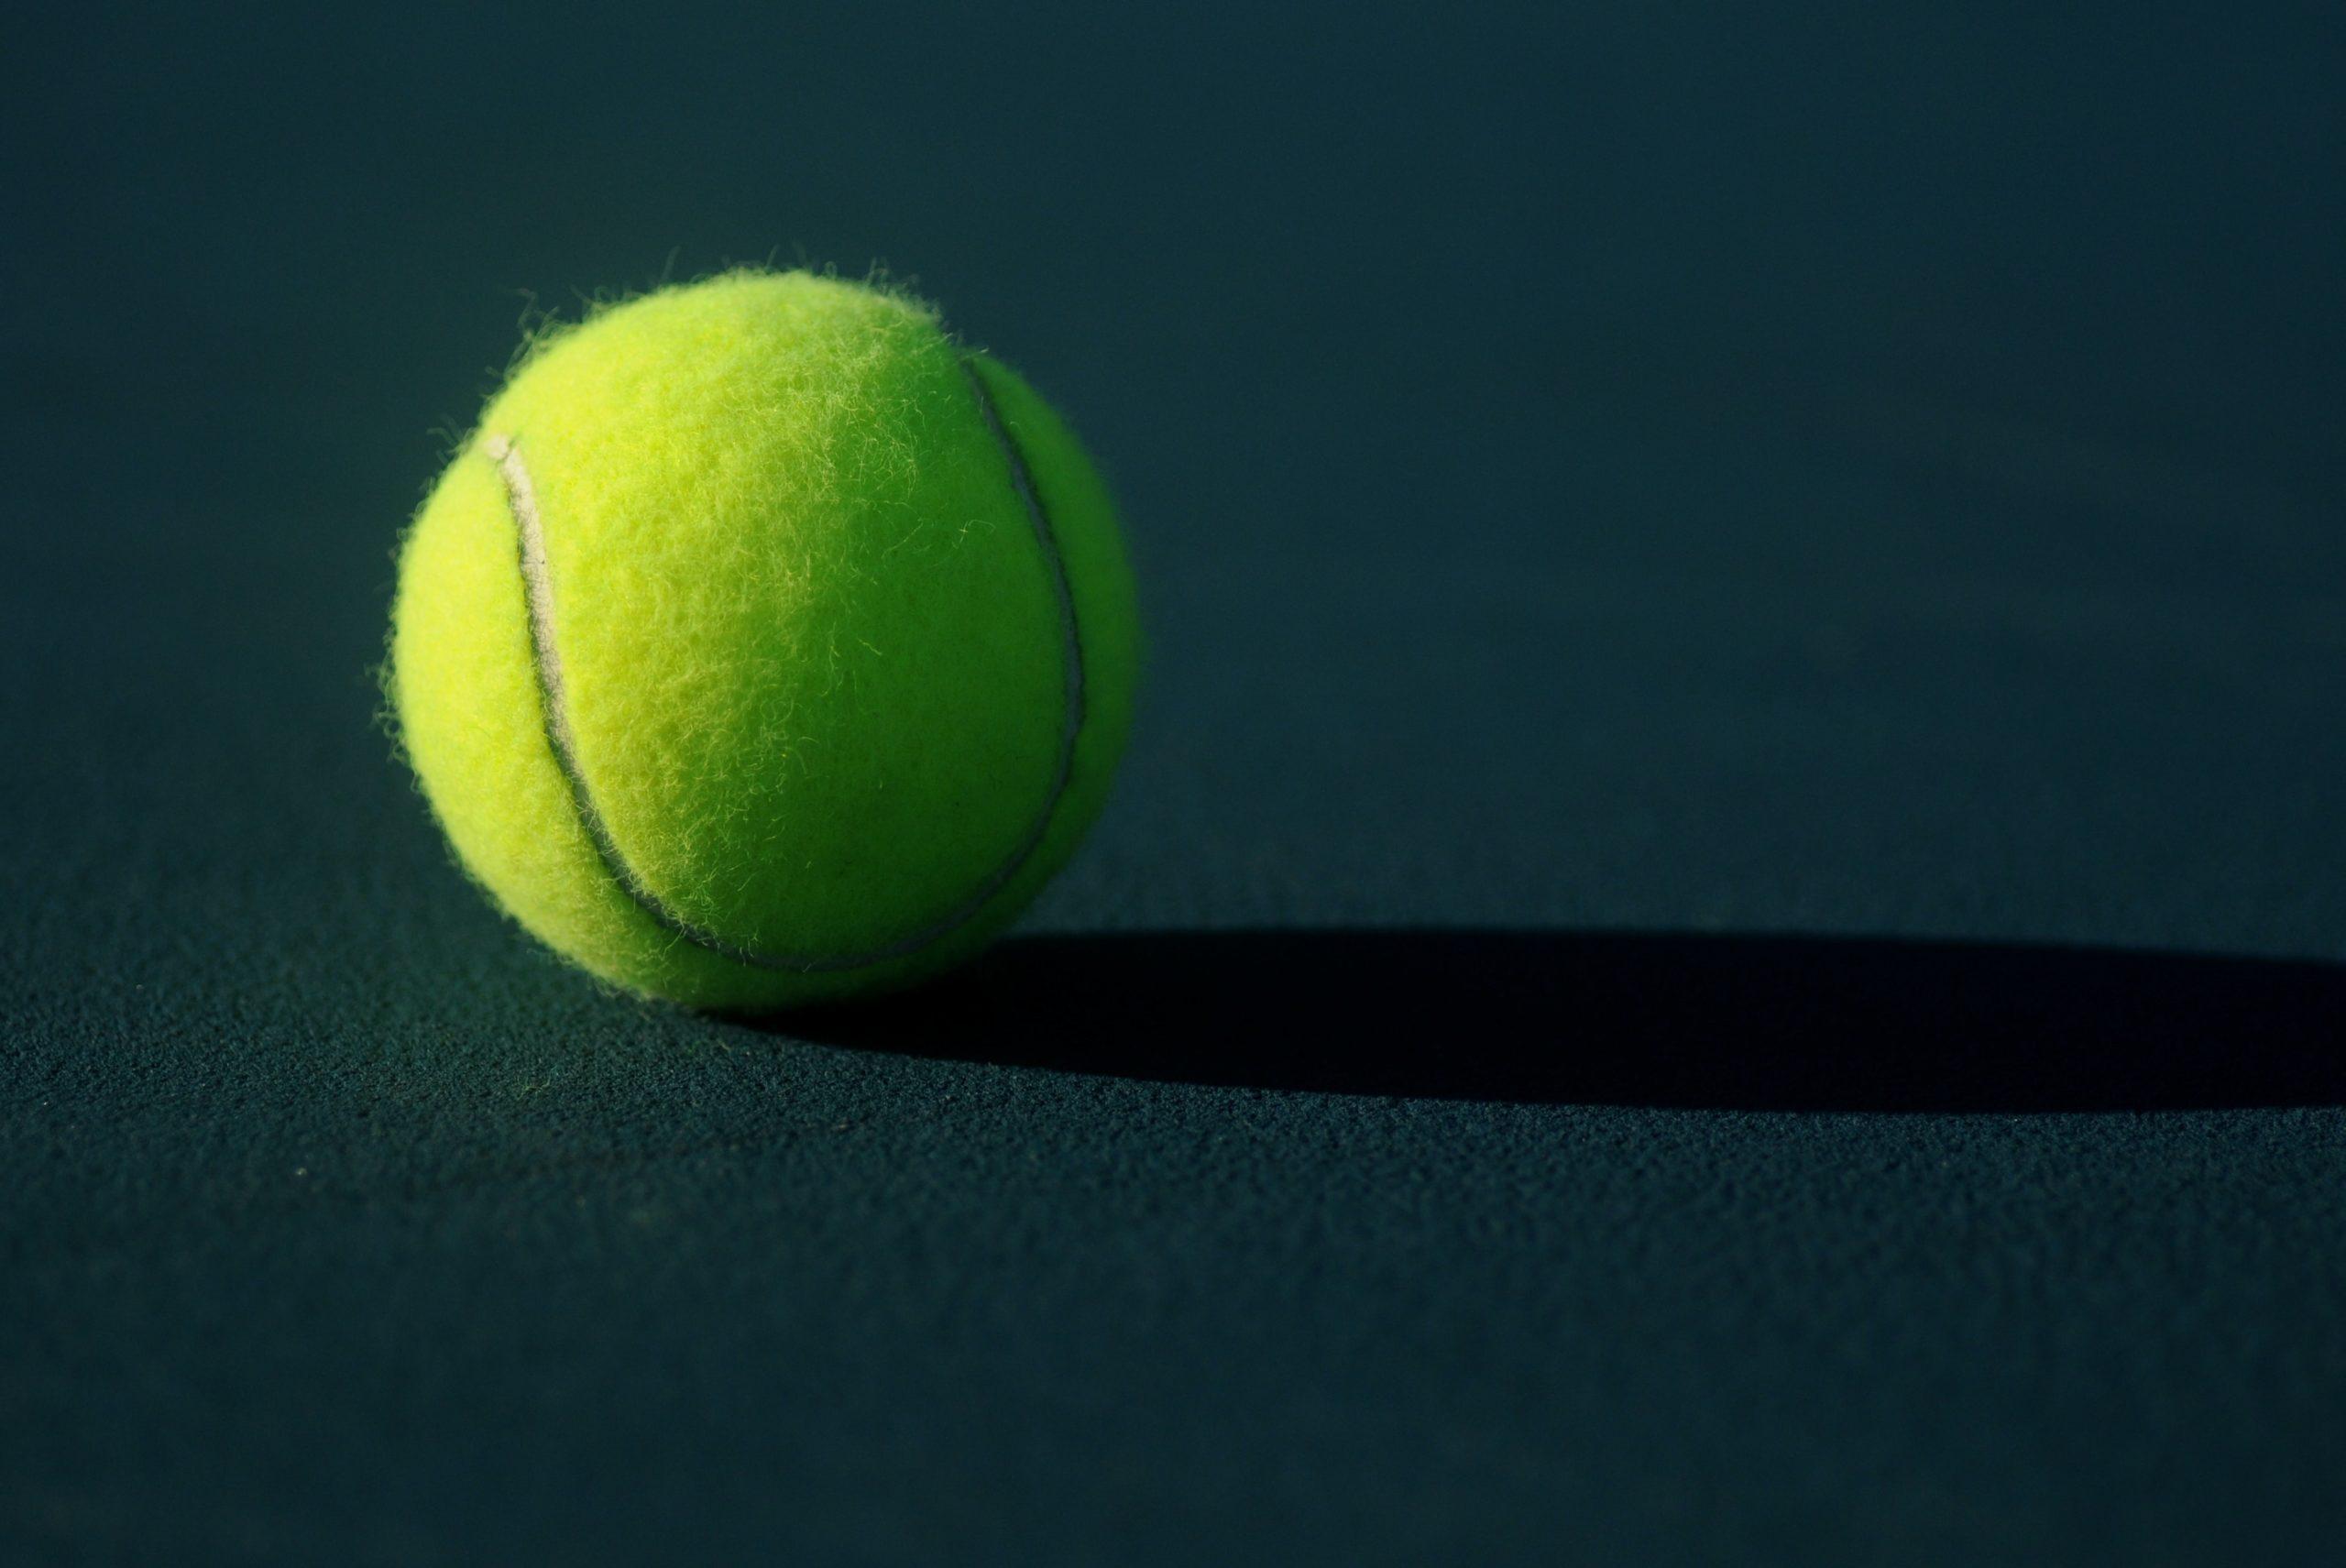 Har du en dålig dag på tennisbanan?